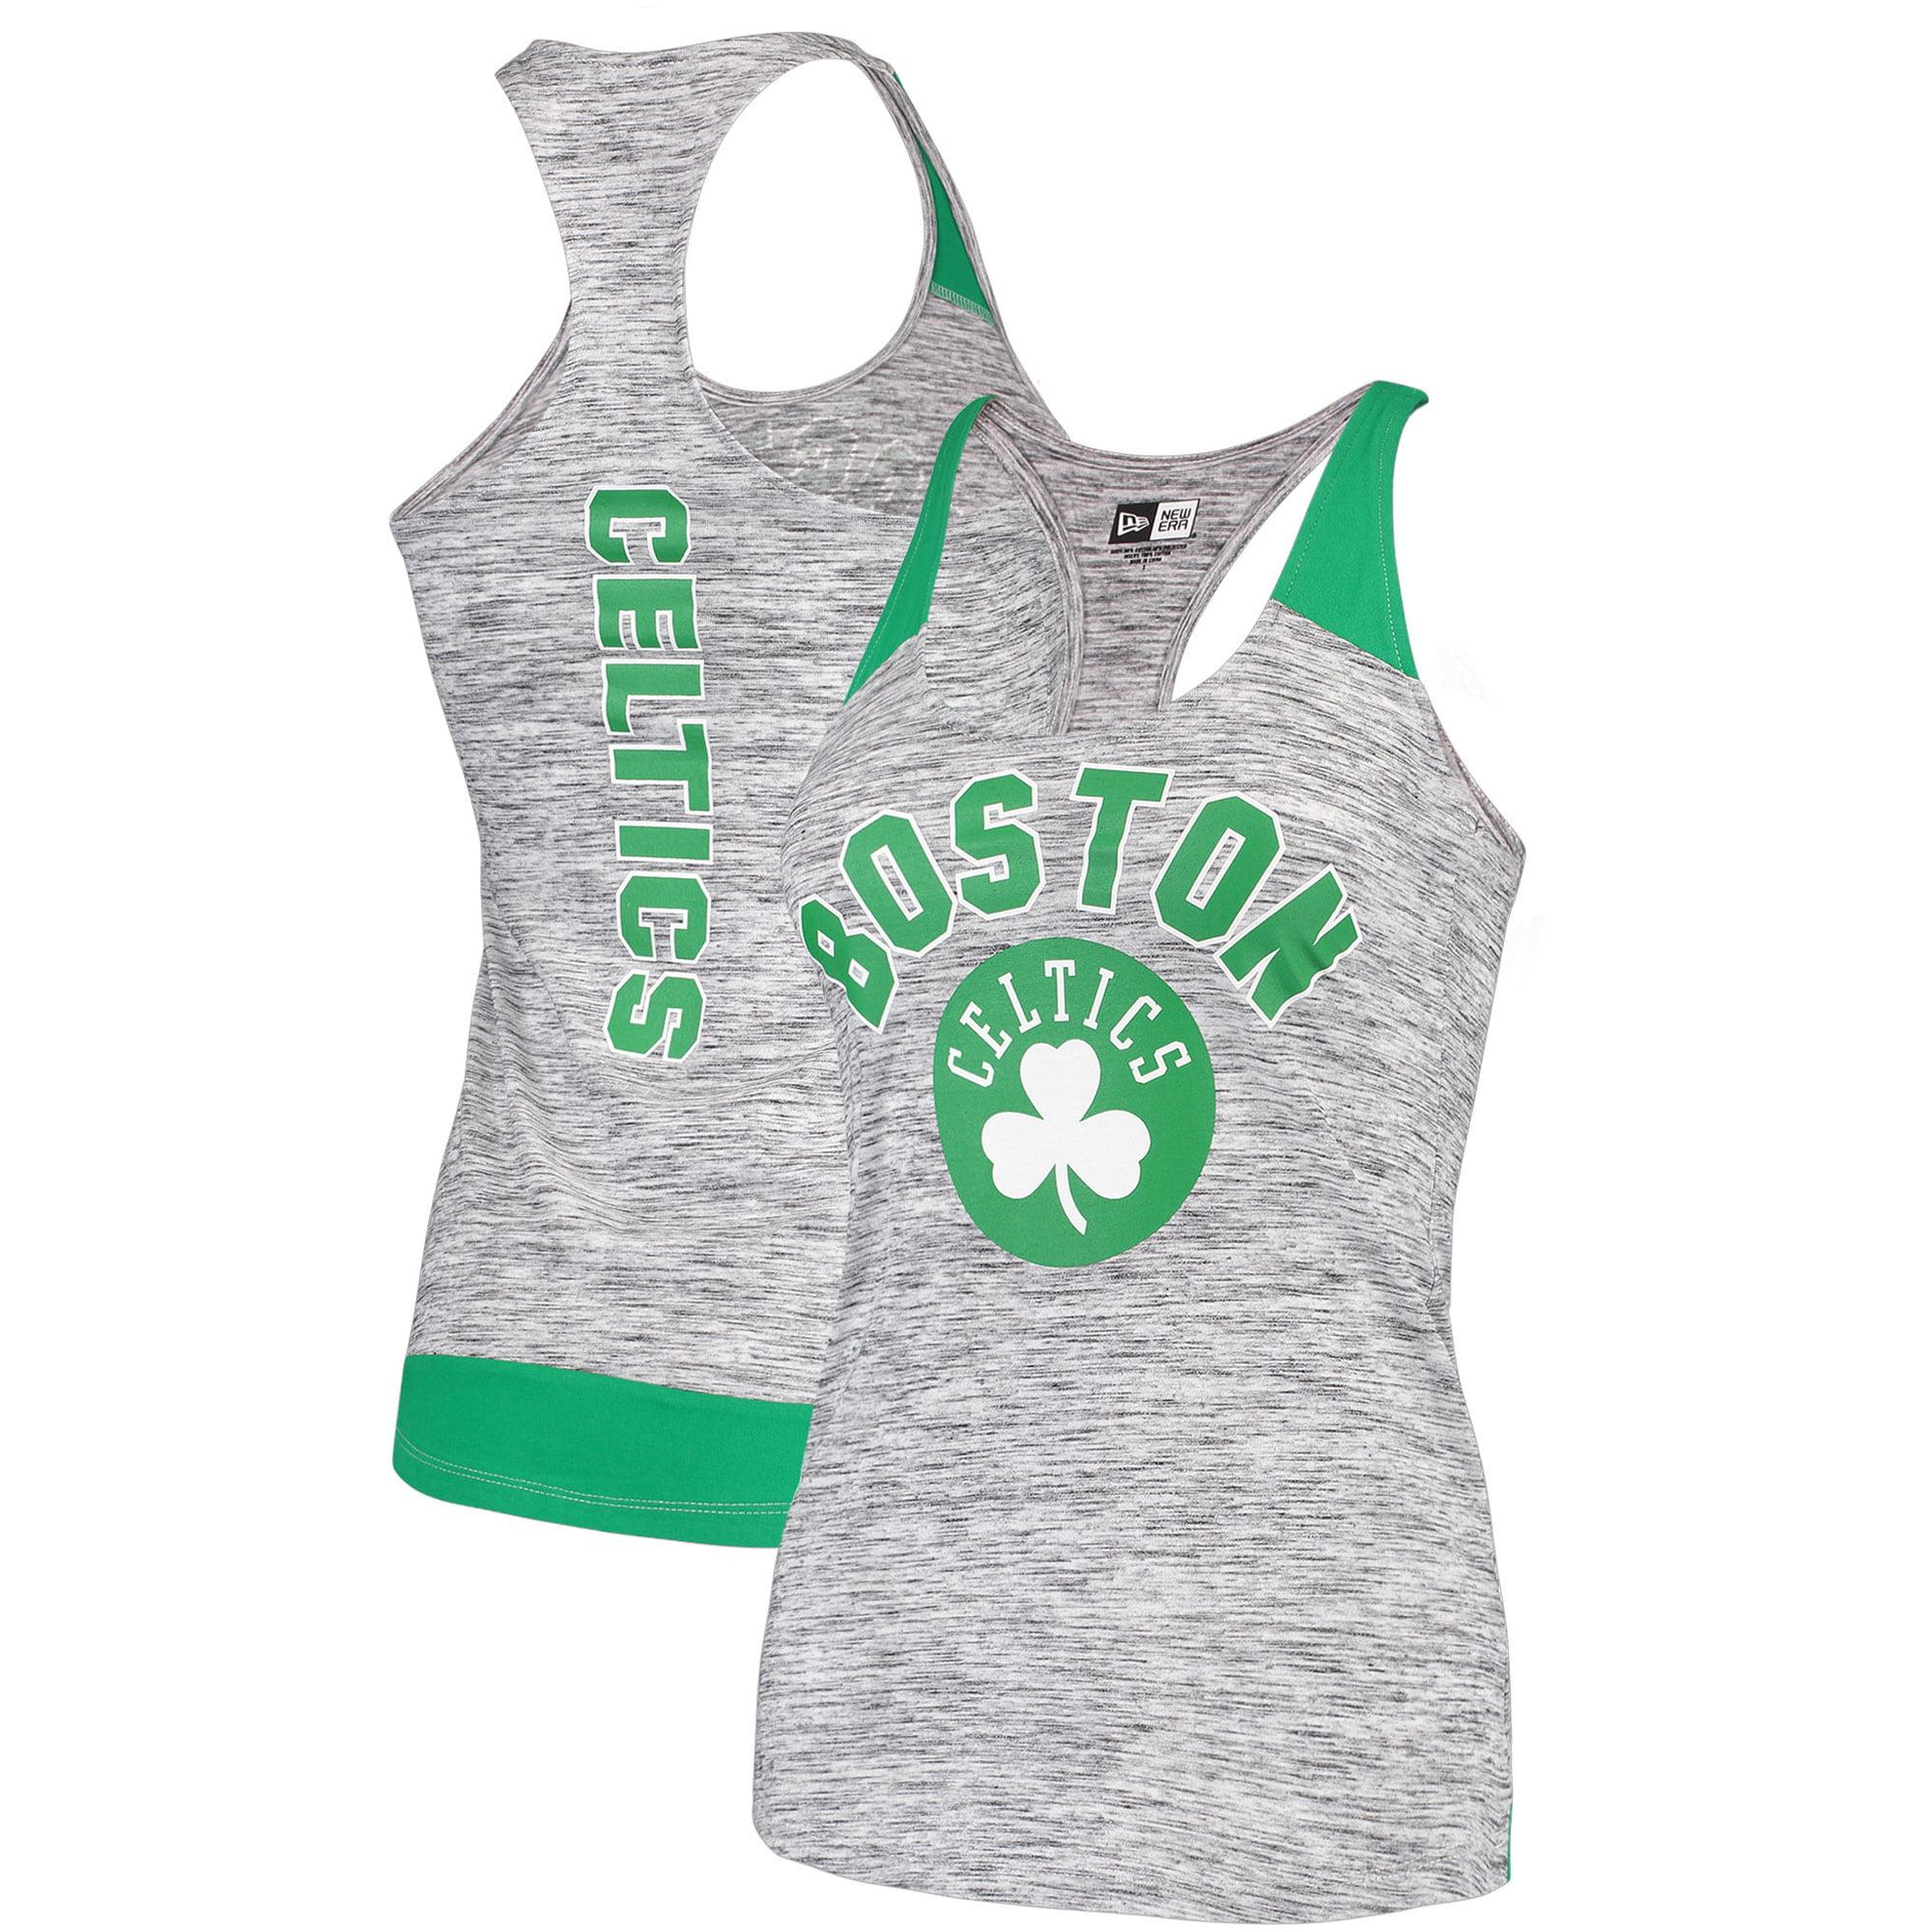 Boston Celtics New Era Women's Space Dye Racer Back Tank Top - Heathered Gray/Kelly Green